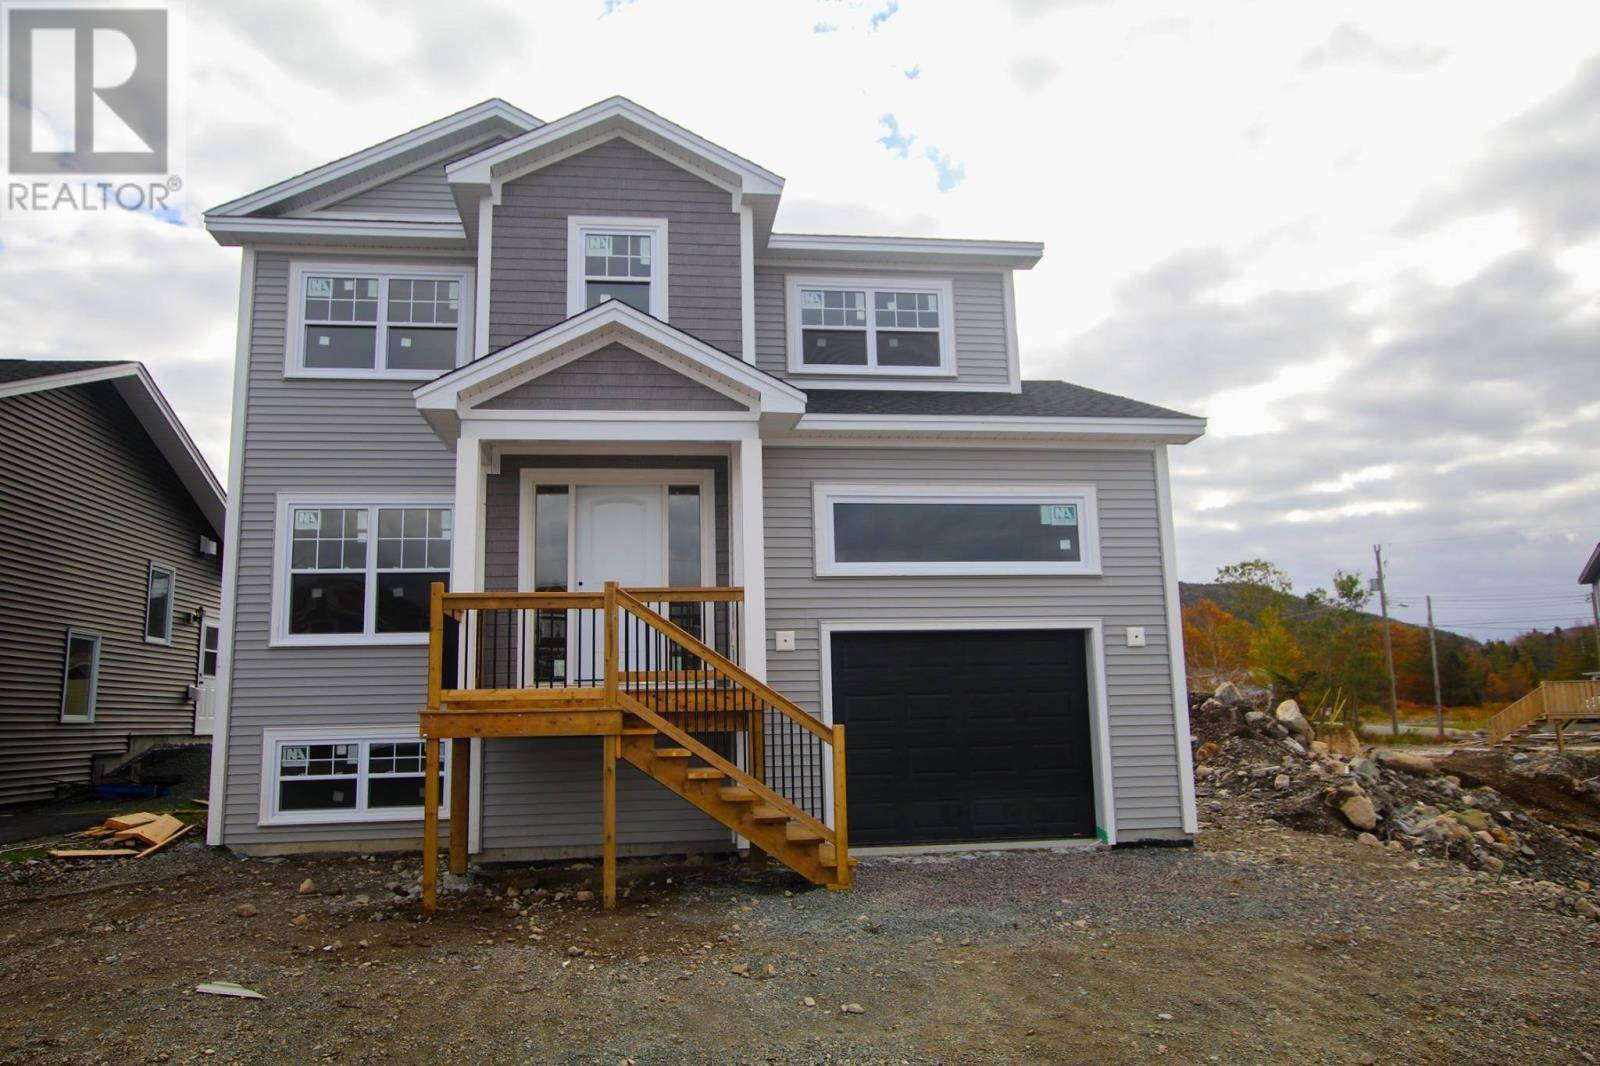 House for sale at 14 Ploughman Pl Unit 2 Conception Bay South Newfoundland - MLS: 1209526